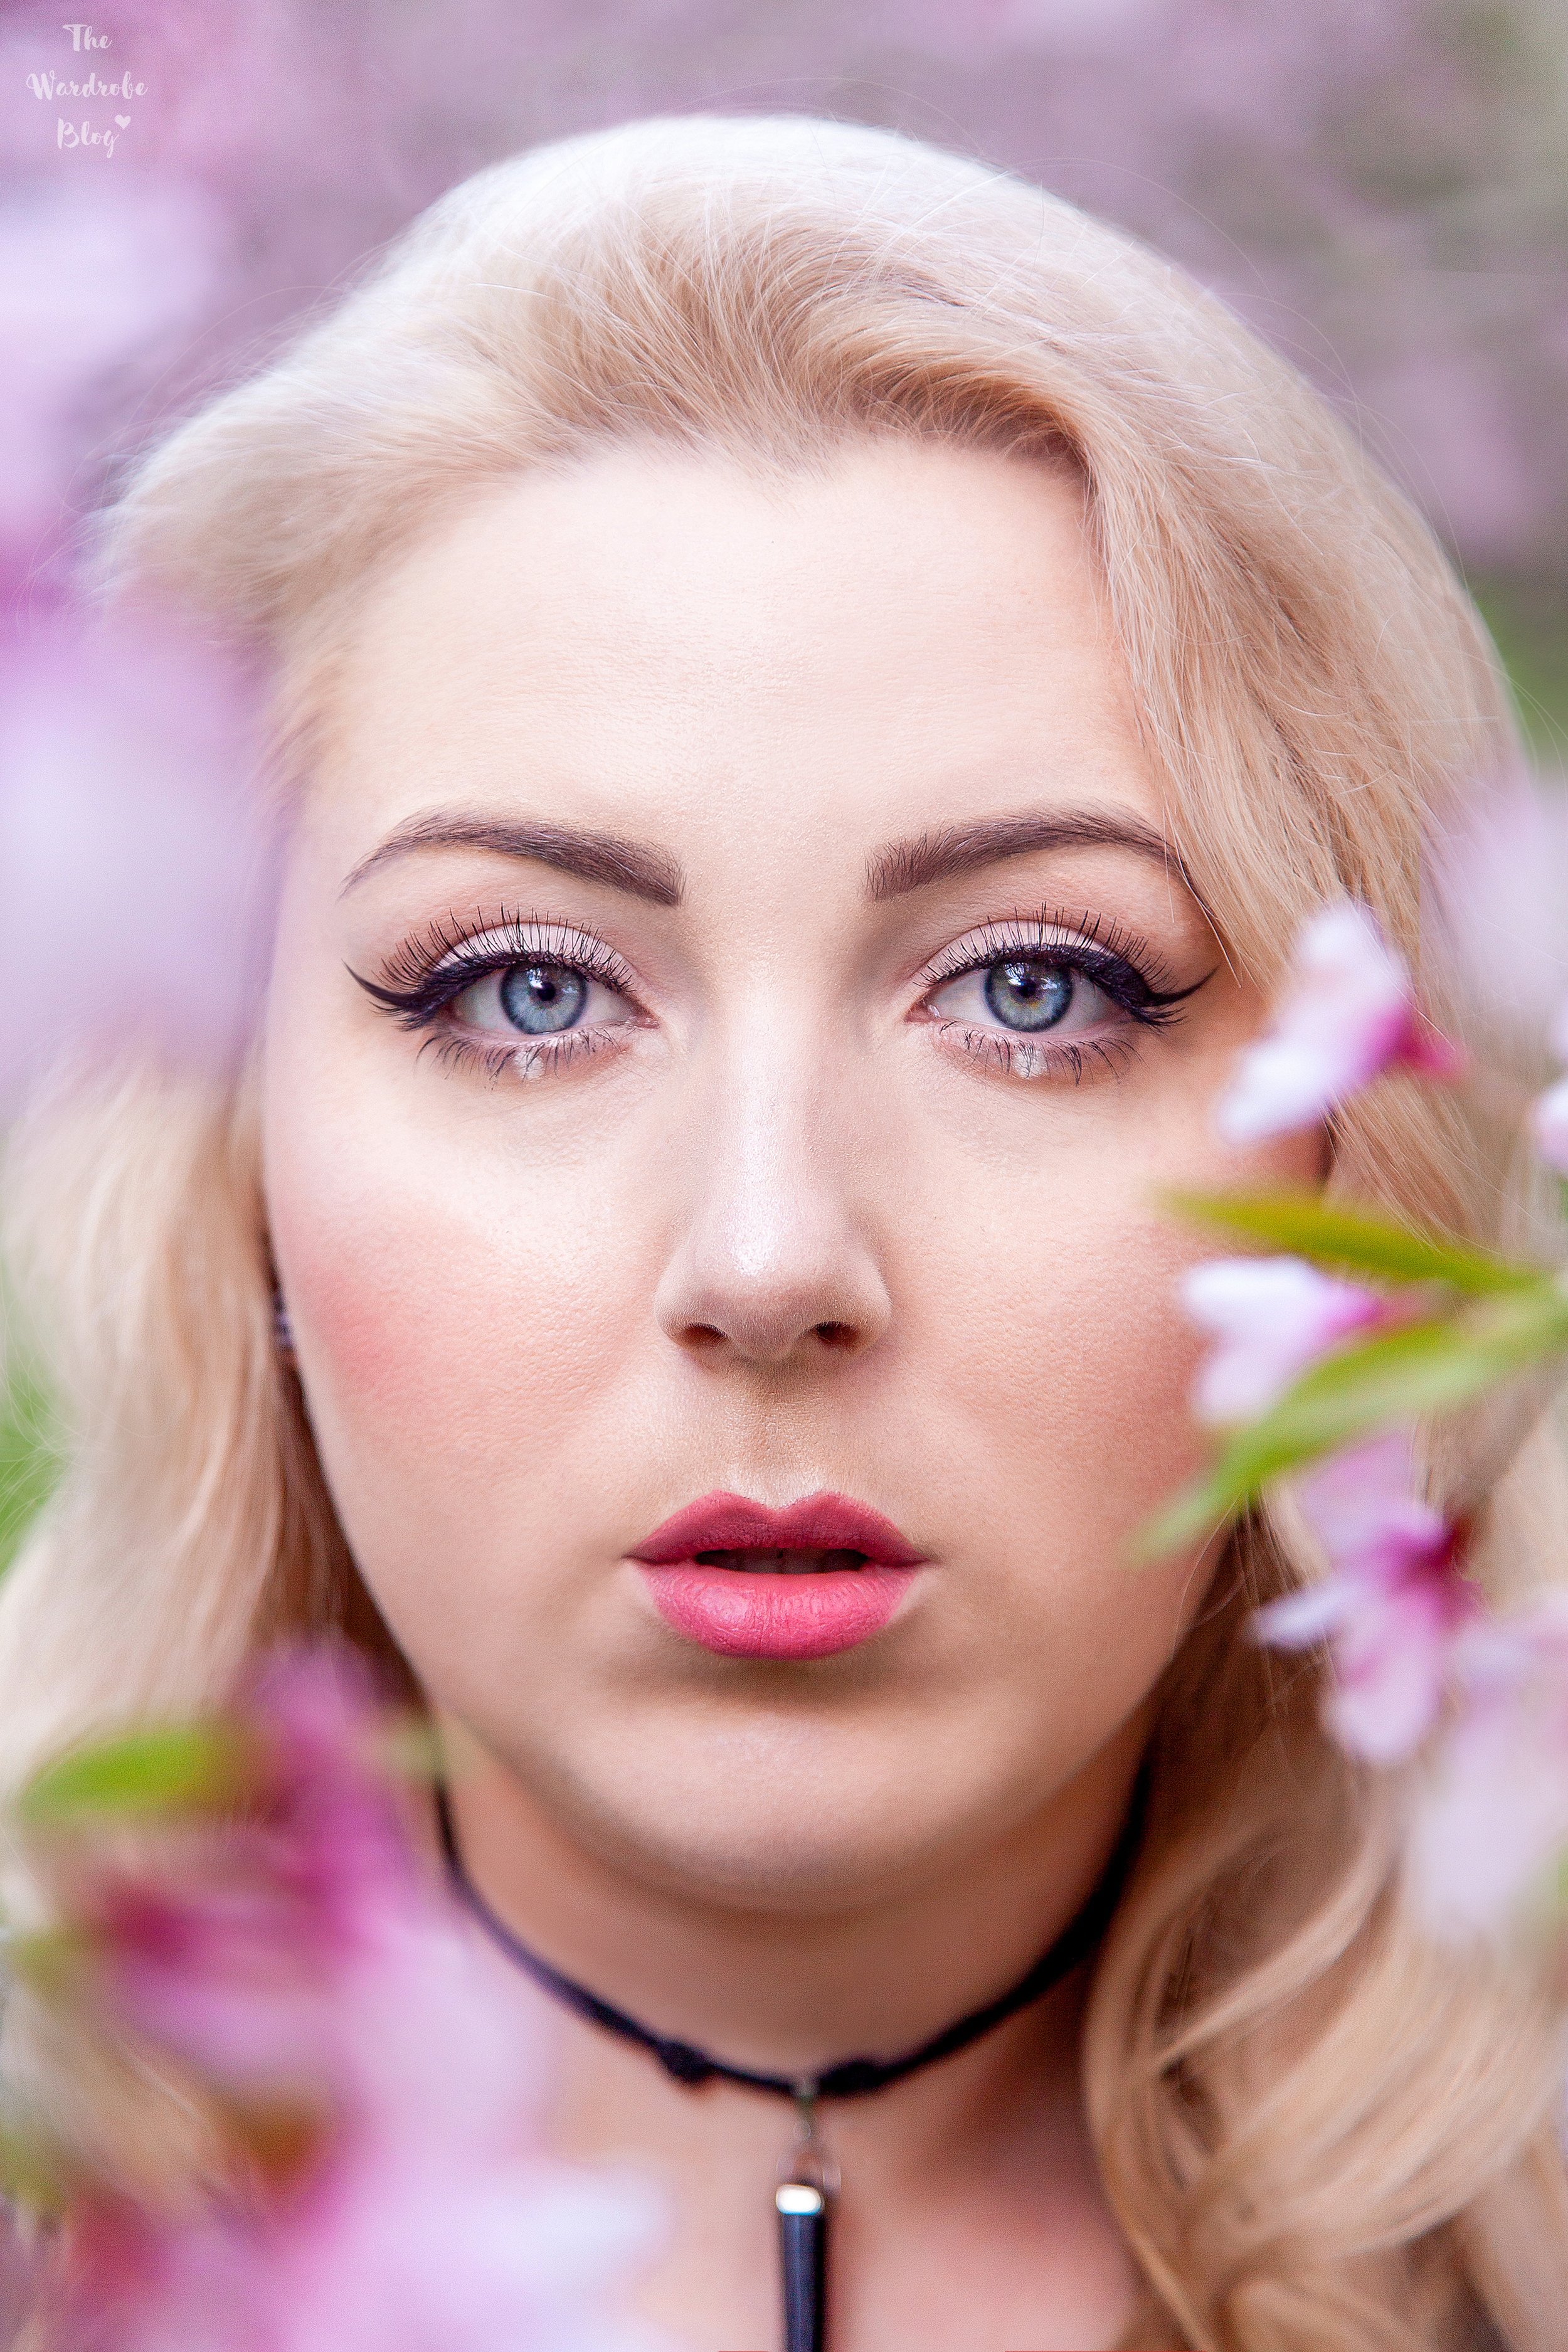 Cherry-Blossom-Makeup-Alternative-The-Wardrobe-Blog